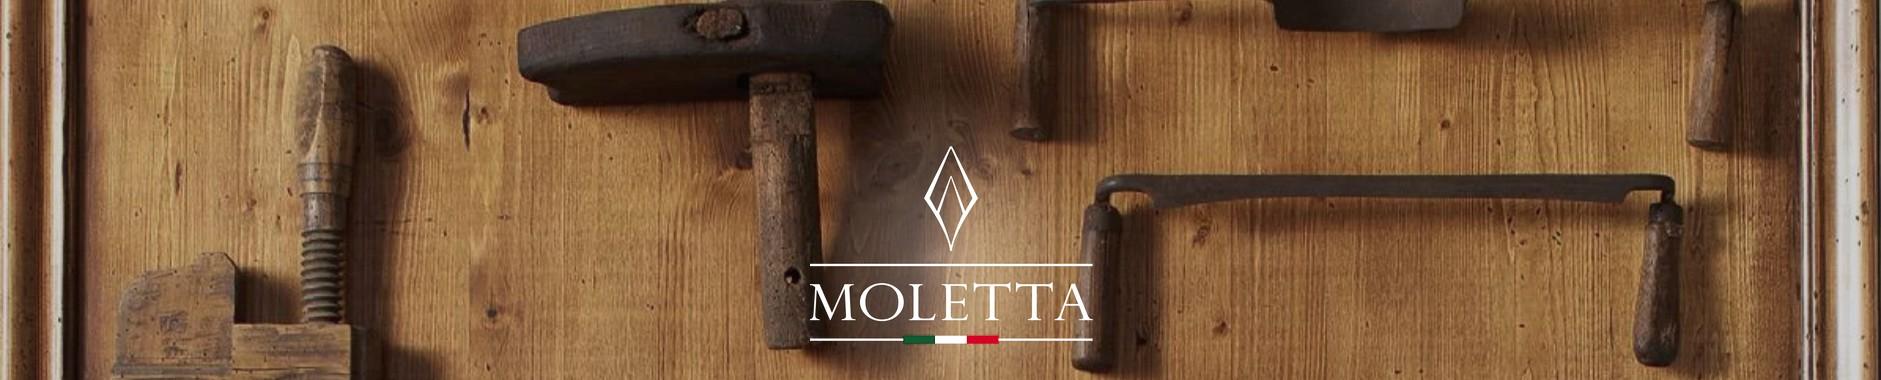 moletta-mobili-madeinitaly